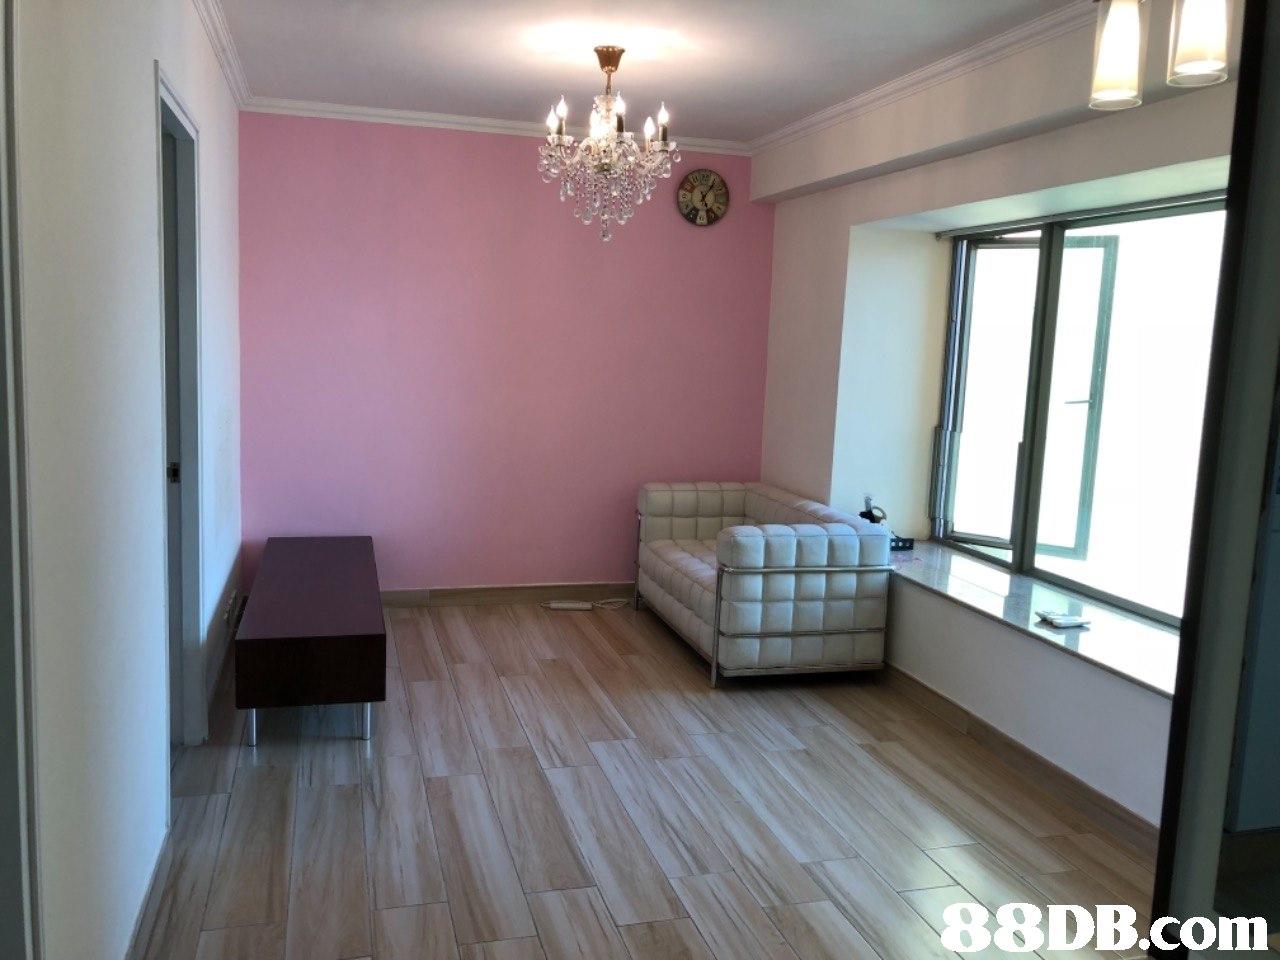 property,room,floor,real estate,laminate flooring